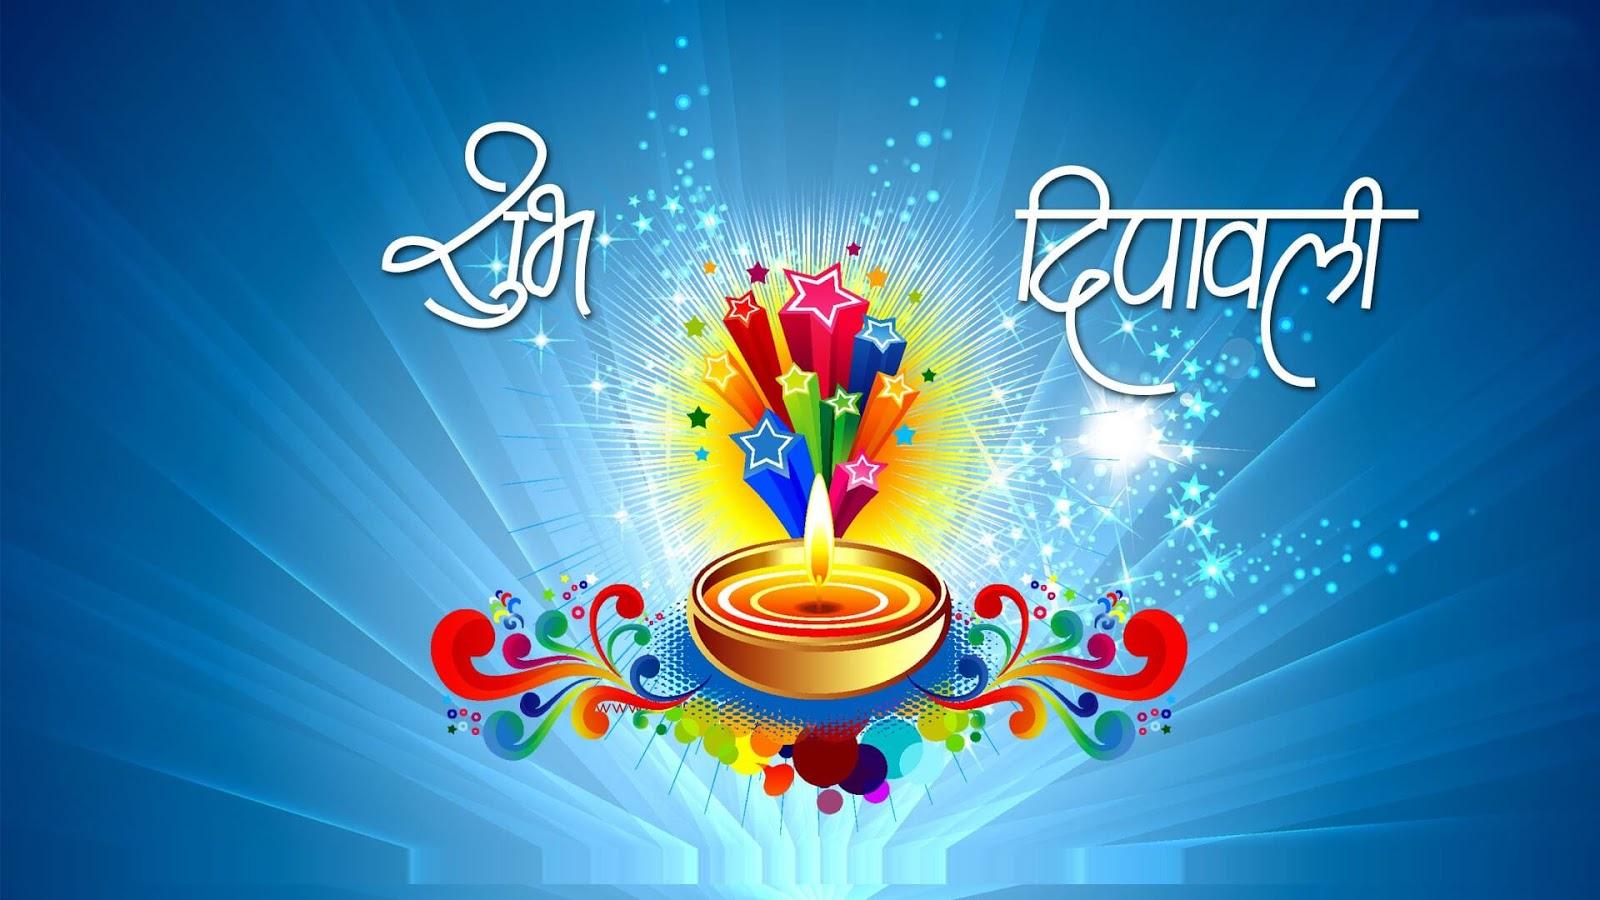 Happy Diwali Wishes 2016 In Hindi Carscoops